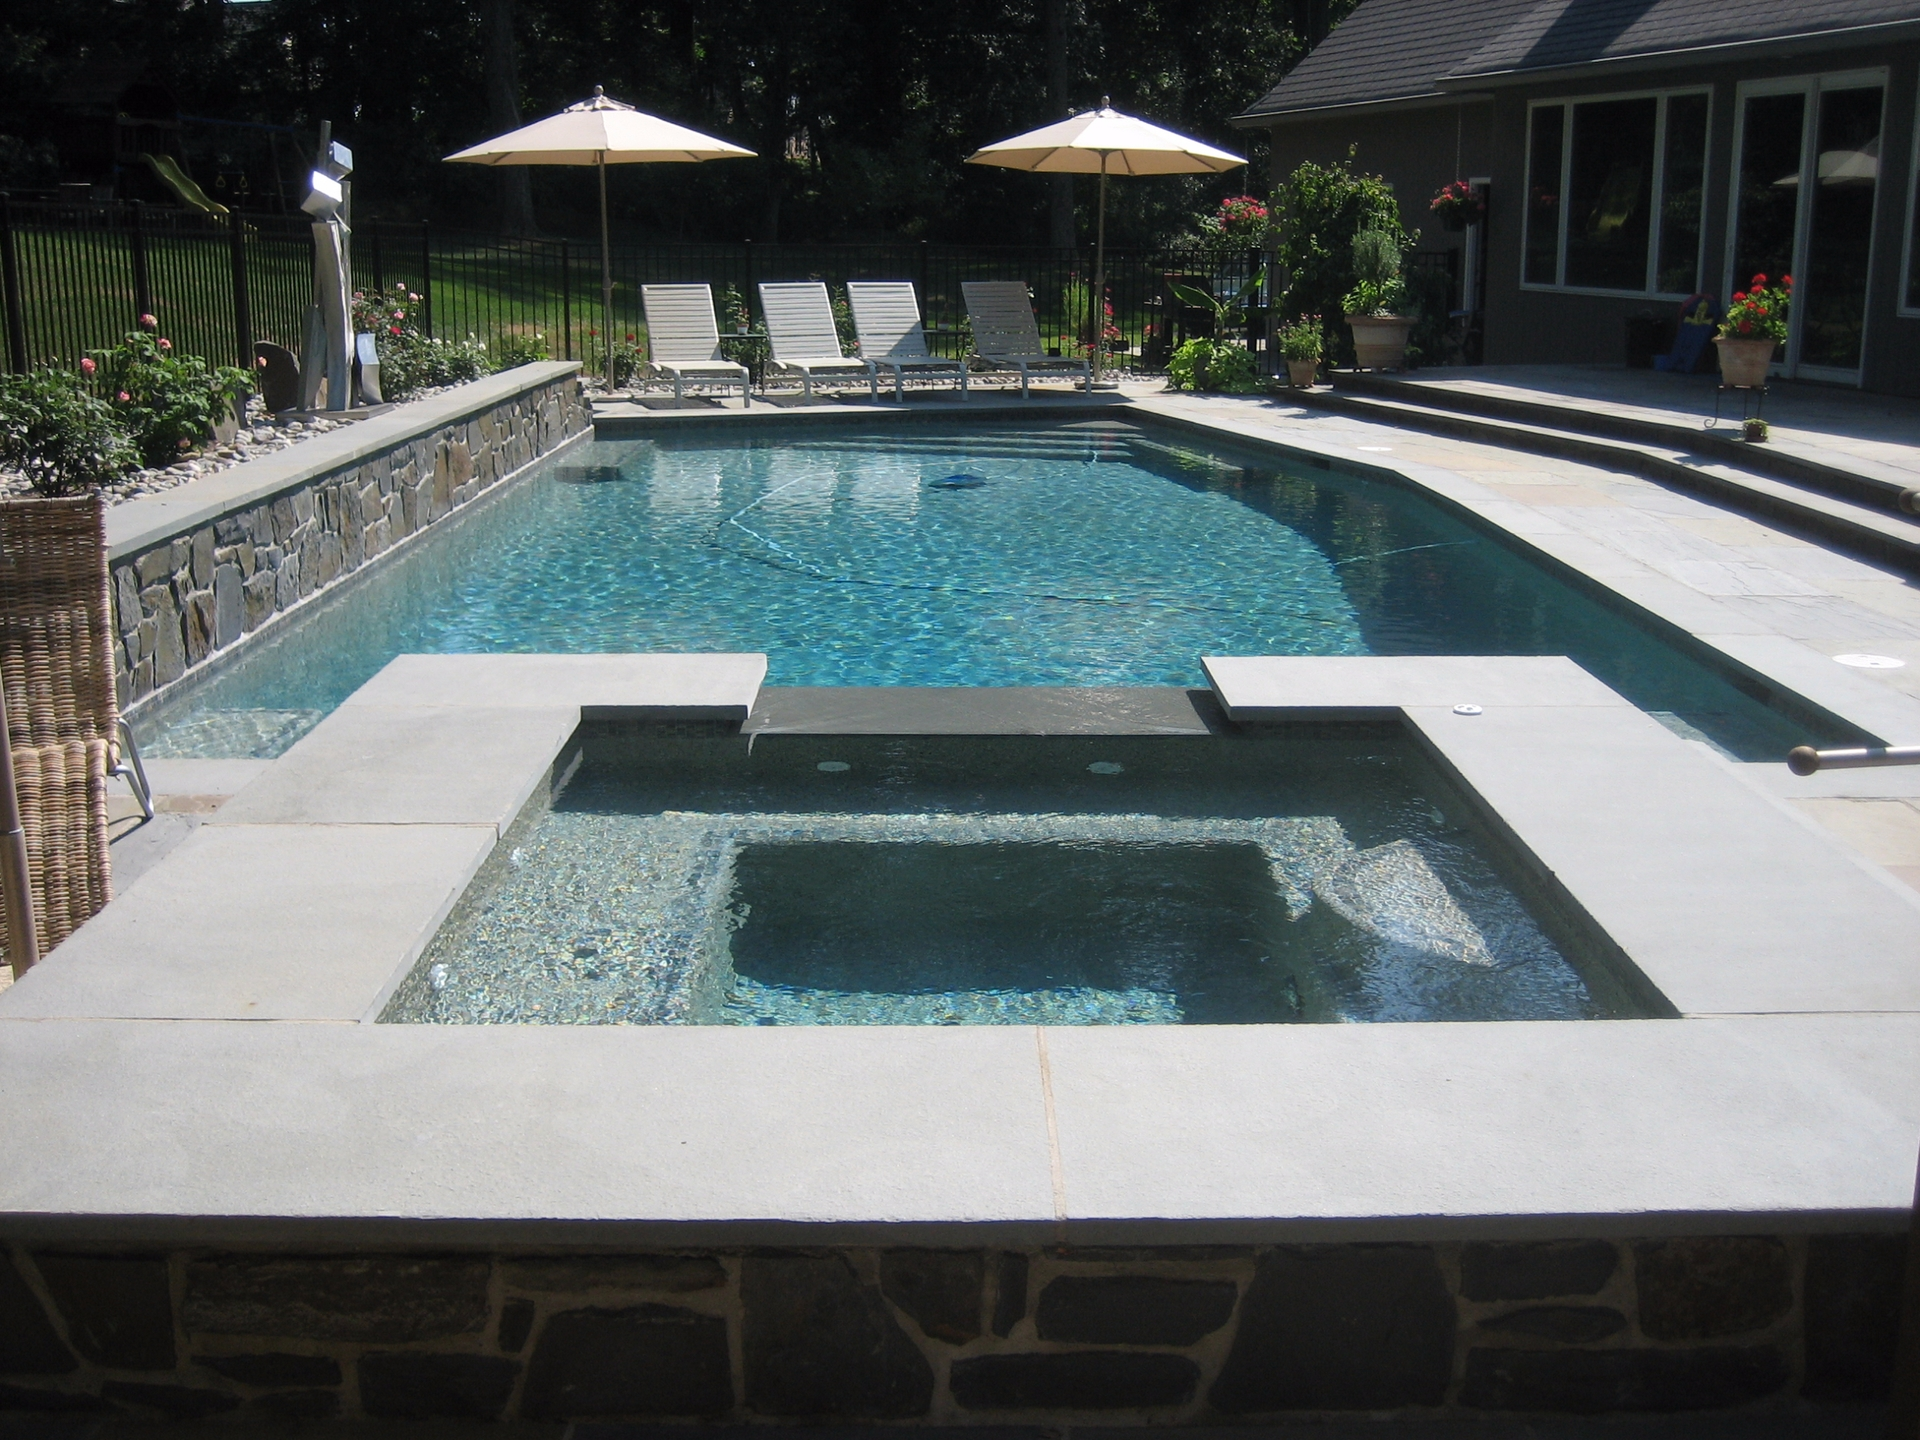 Arista Pool & Spa Inc (@aristapools1) Cover Image